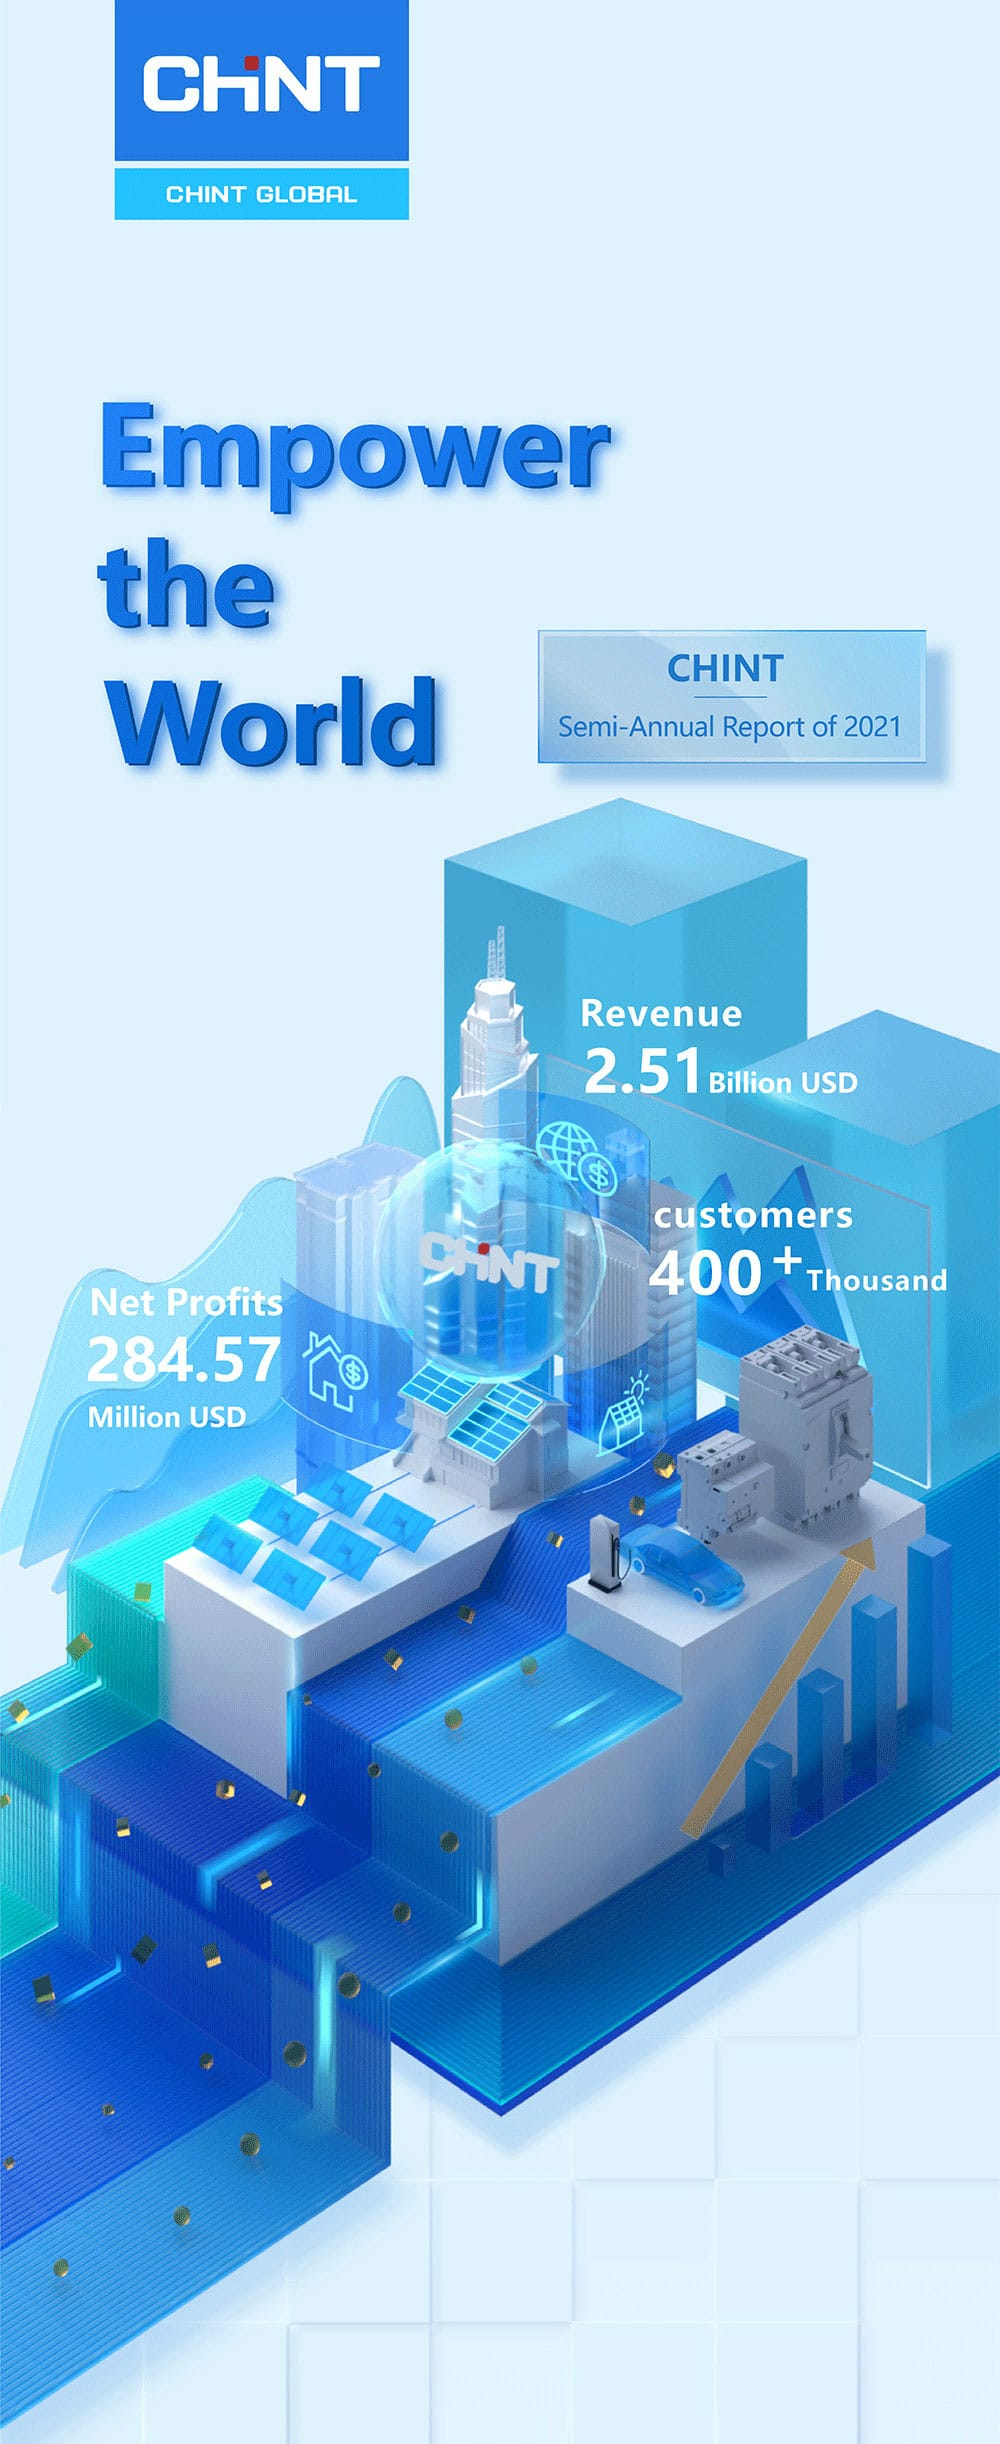 CHINT Semi-Annual Report of 2021